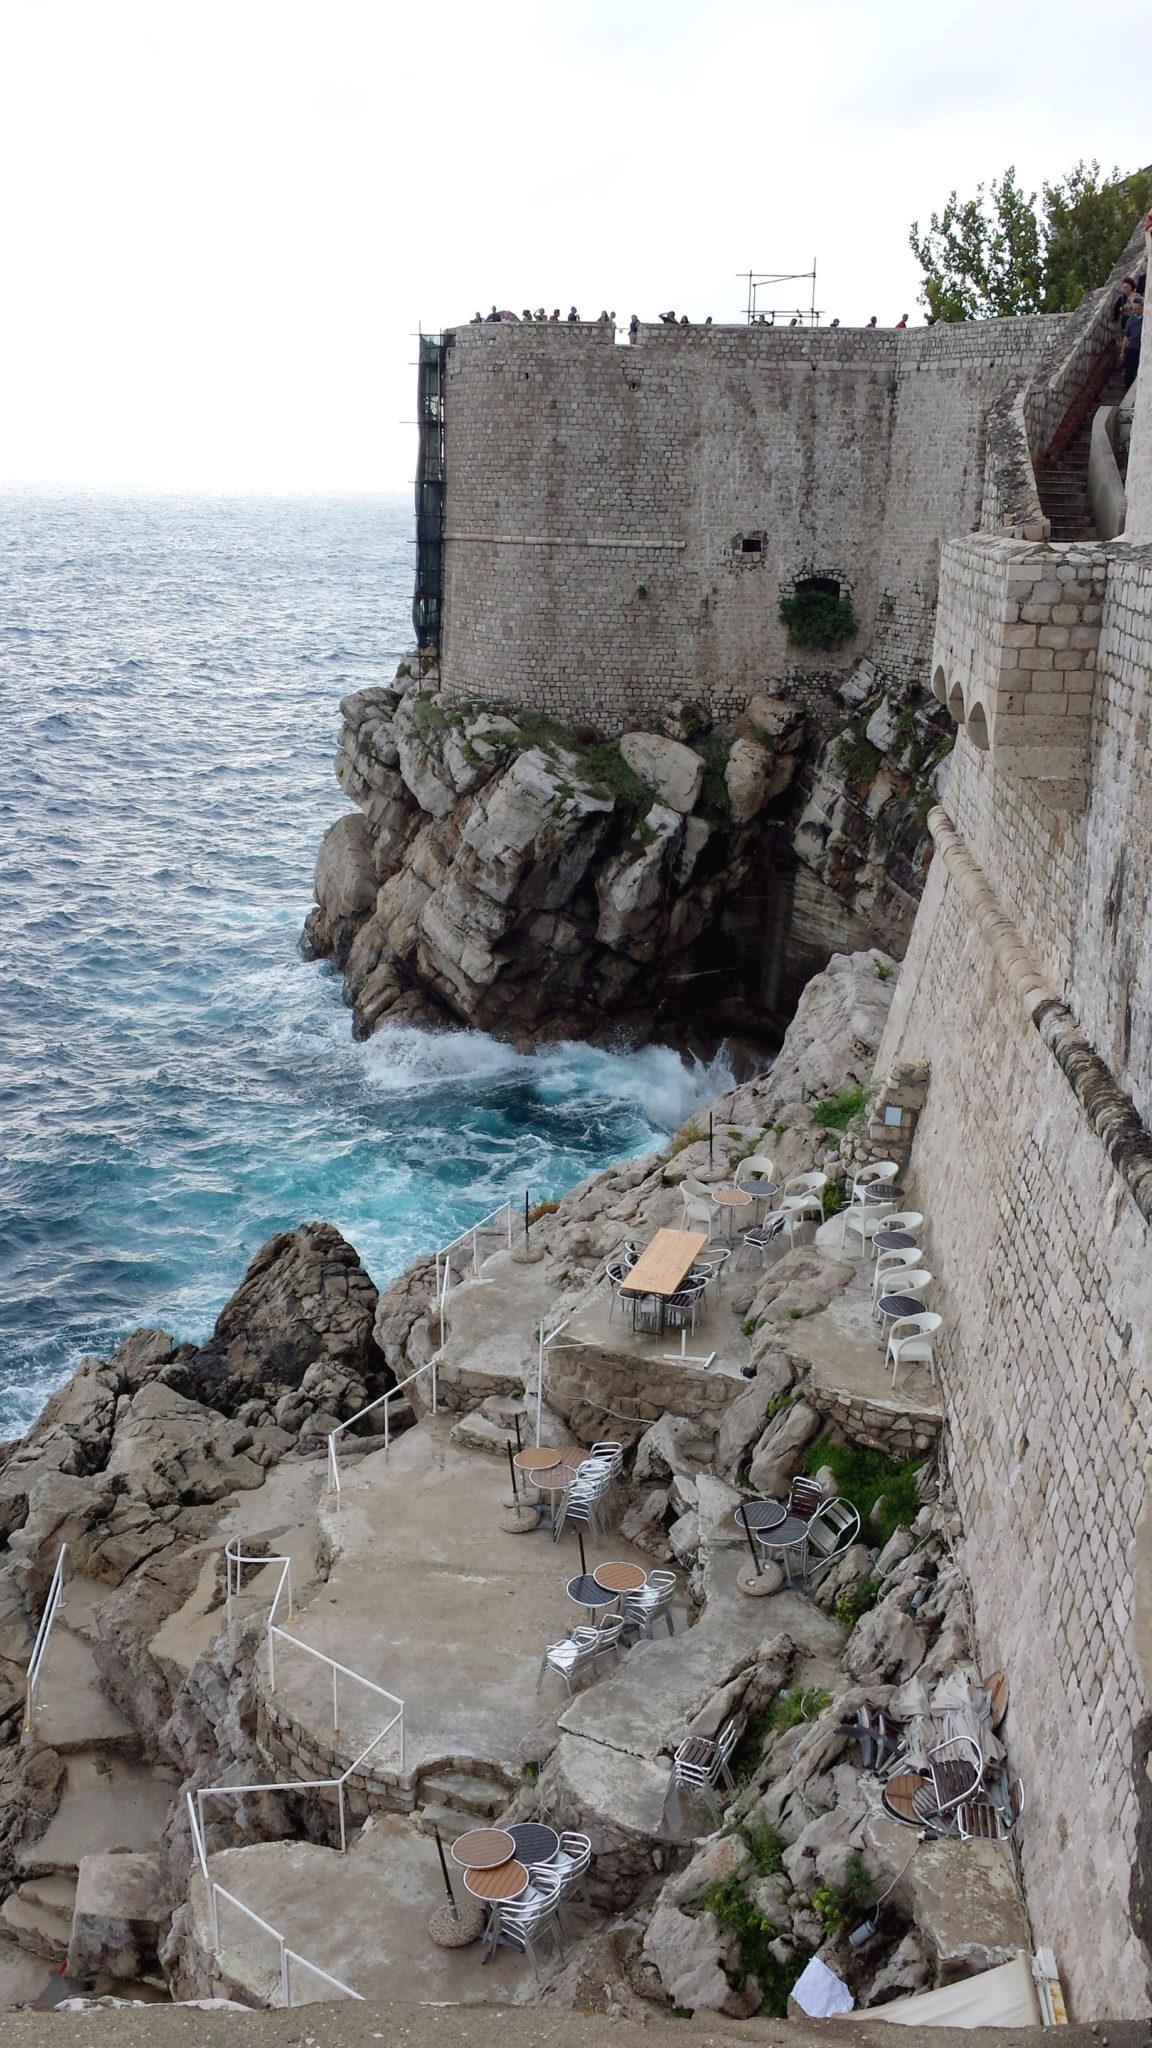 Hema_blog_mode_voyage_croatie_une_journee_a_dubrovnik_cafe_falaise2